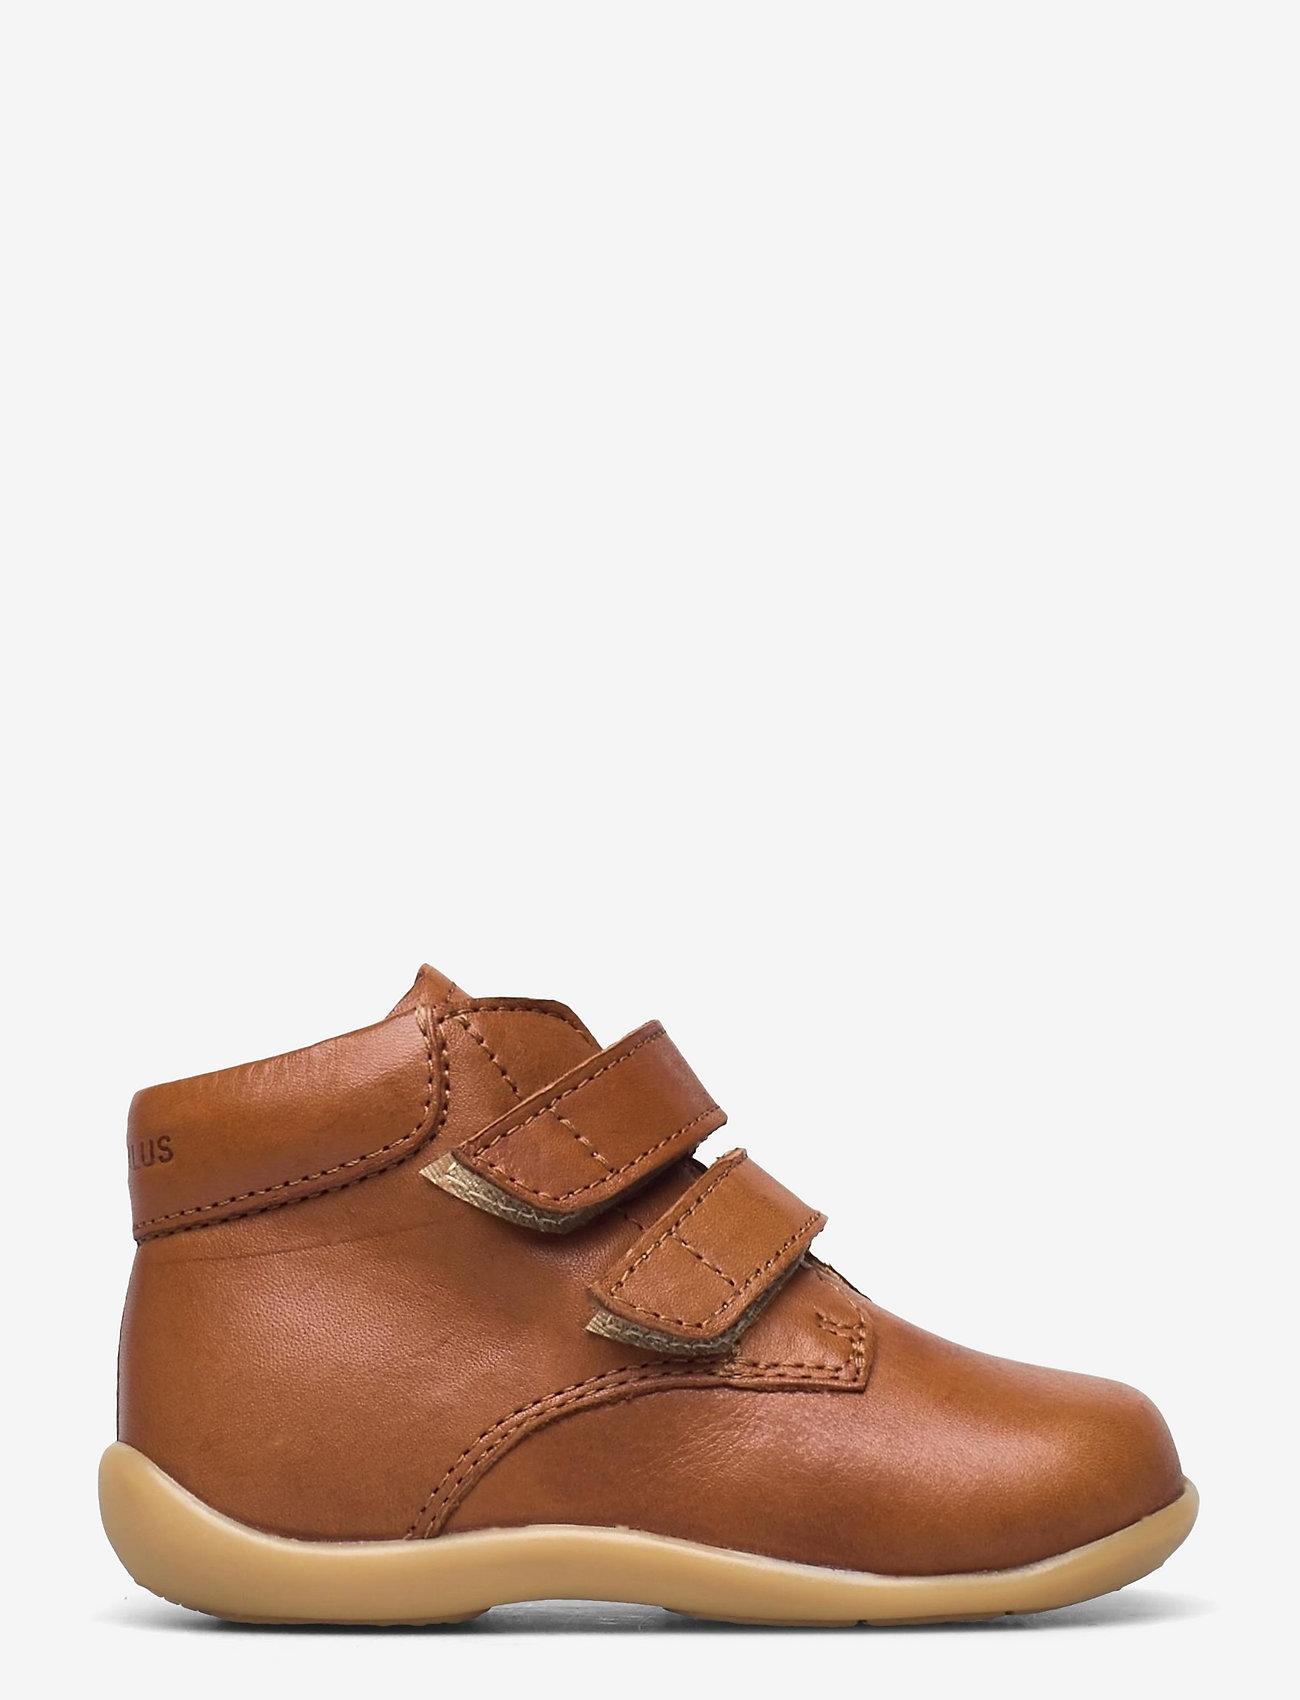 ANGULUS - Boots - flat - with velcro - lauflernschuhe - 1545 cognac - 1